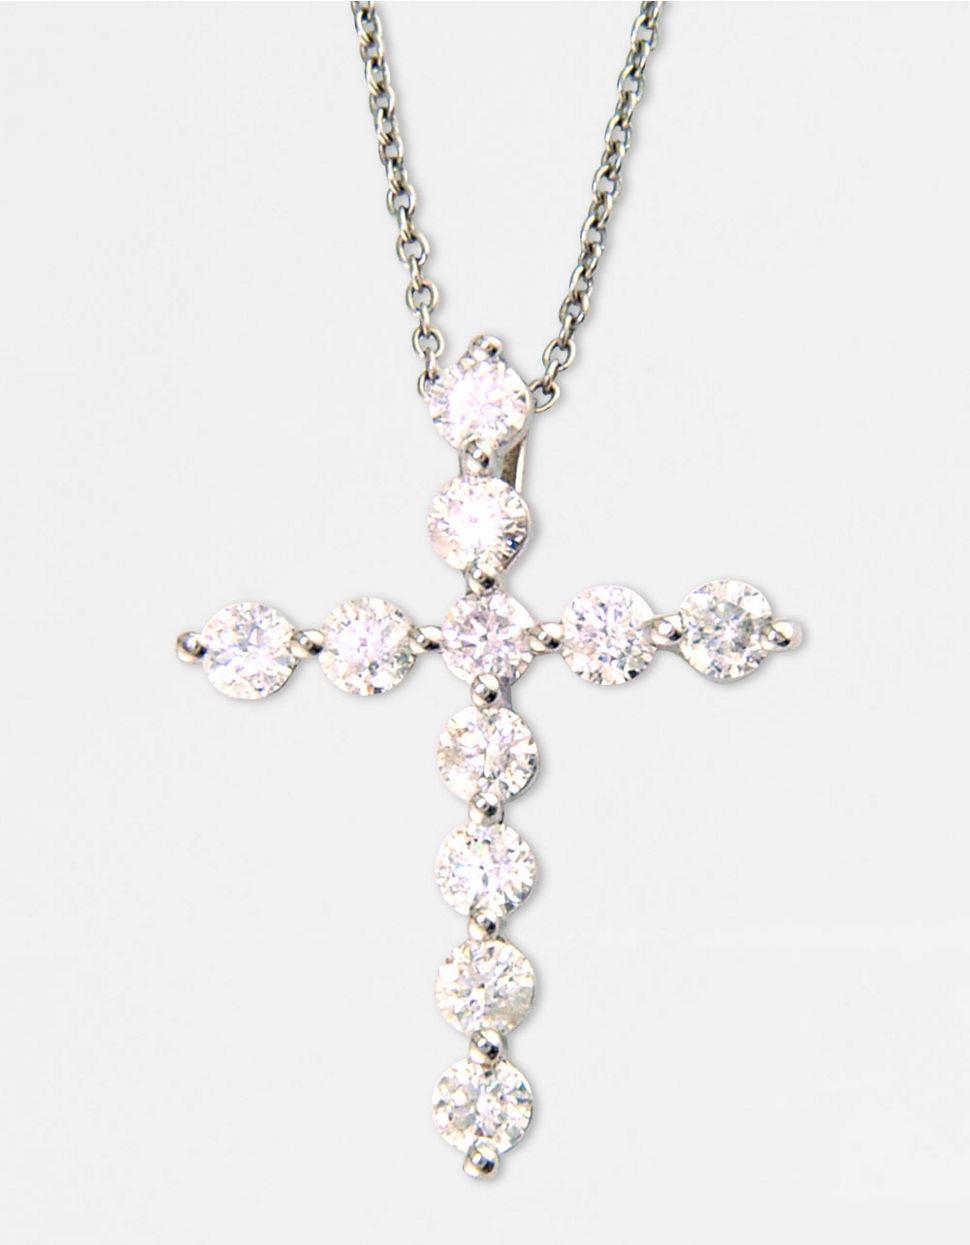 565d8a3c899ee Effy Classique 14k White Gold Diamond Cross Pendant Necklace in ...